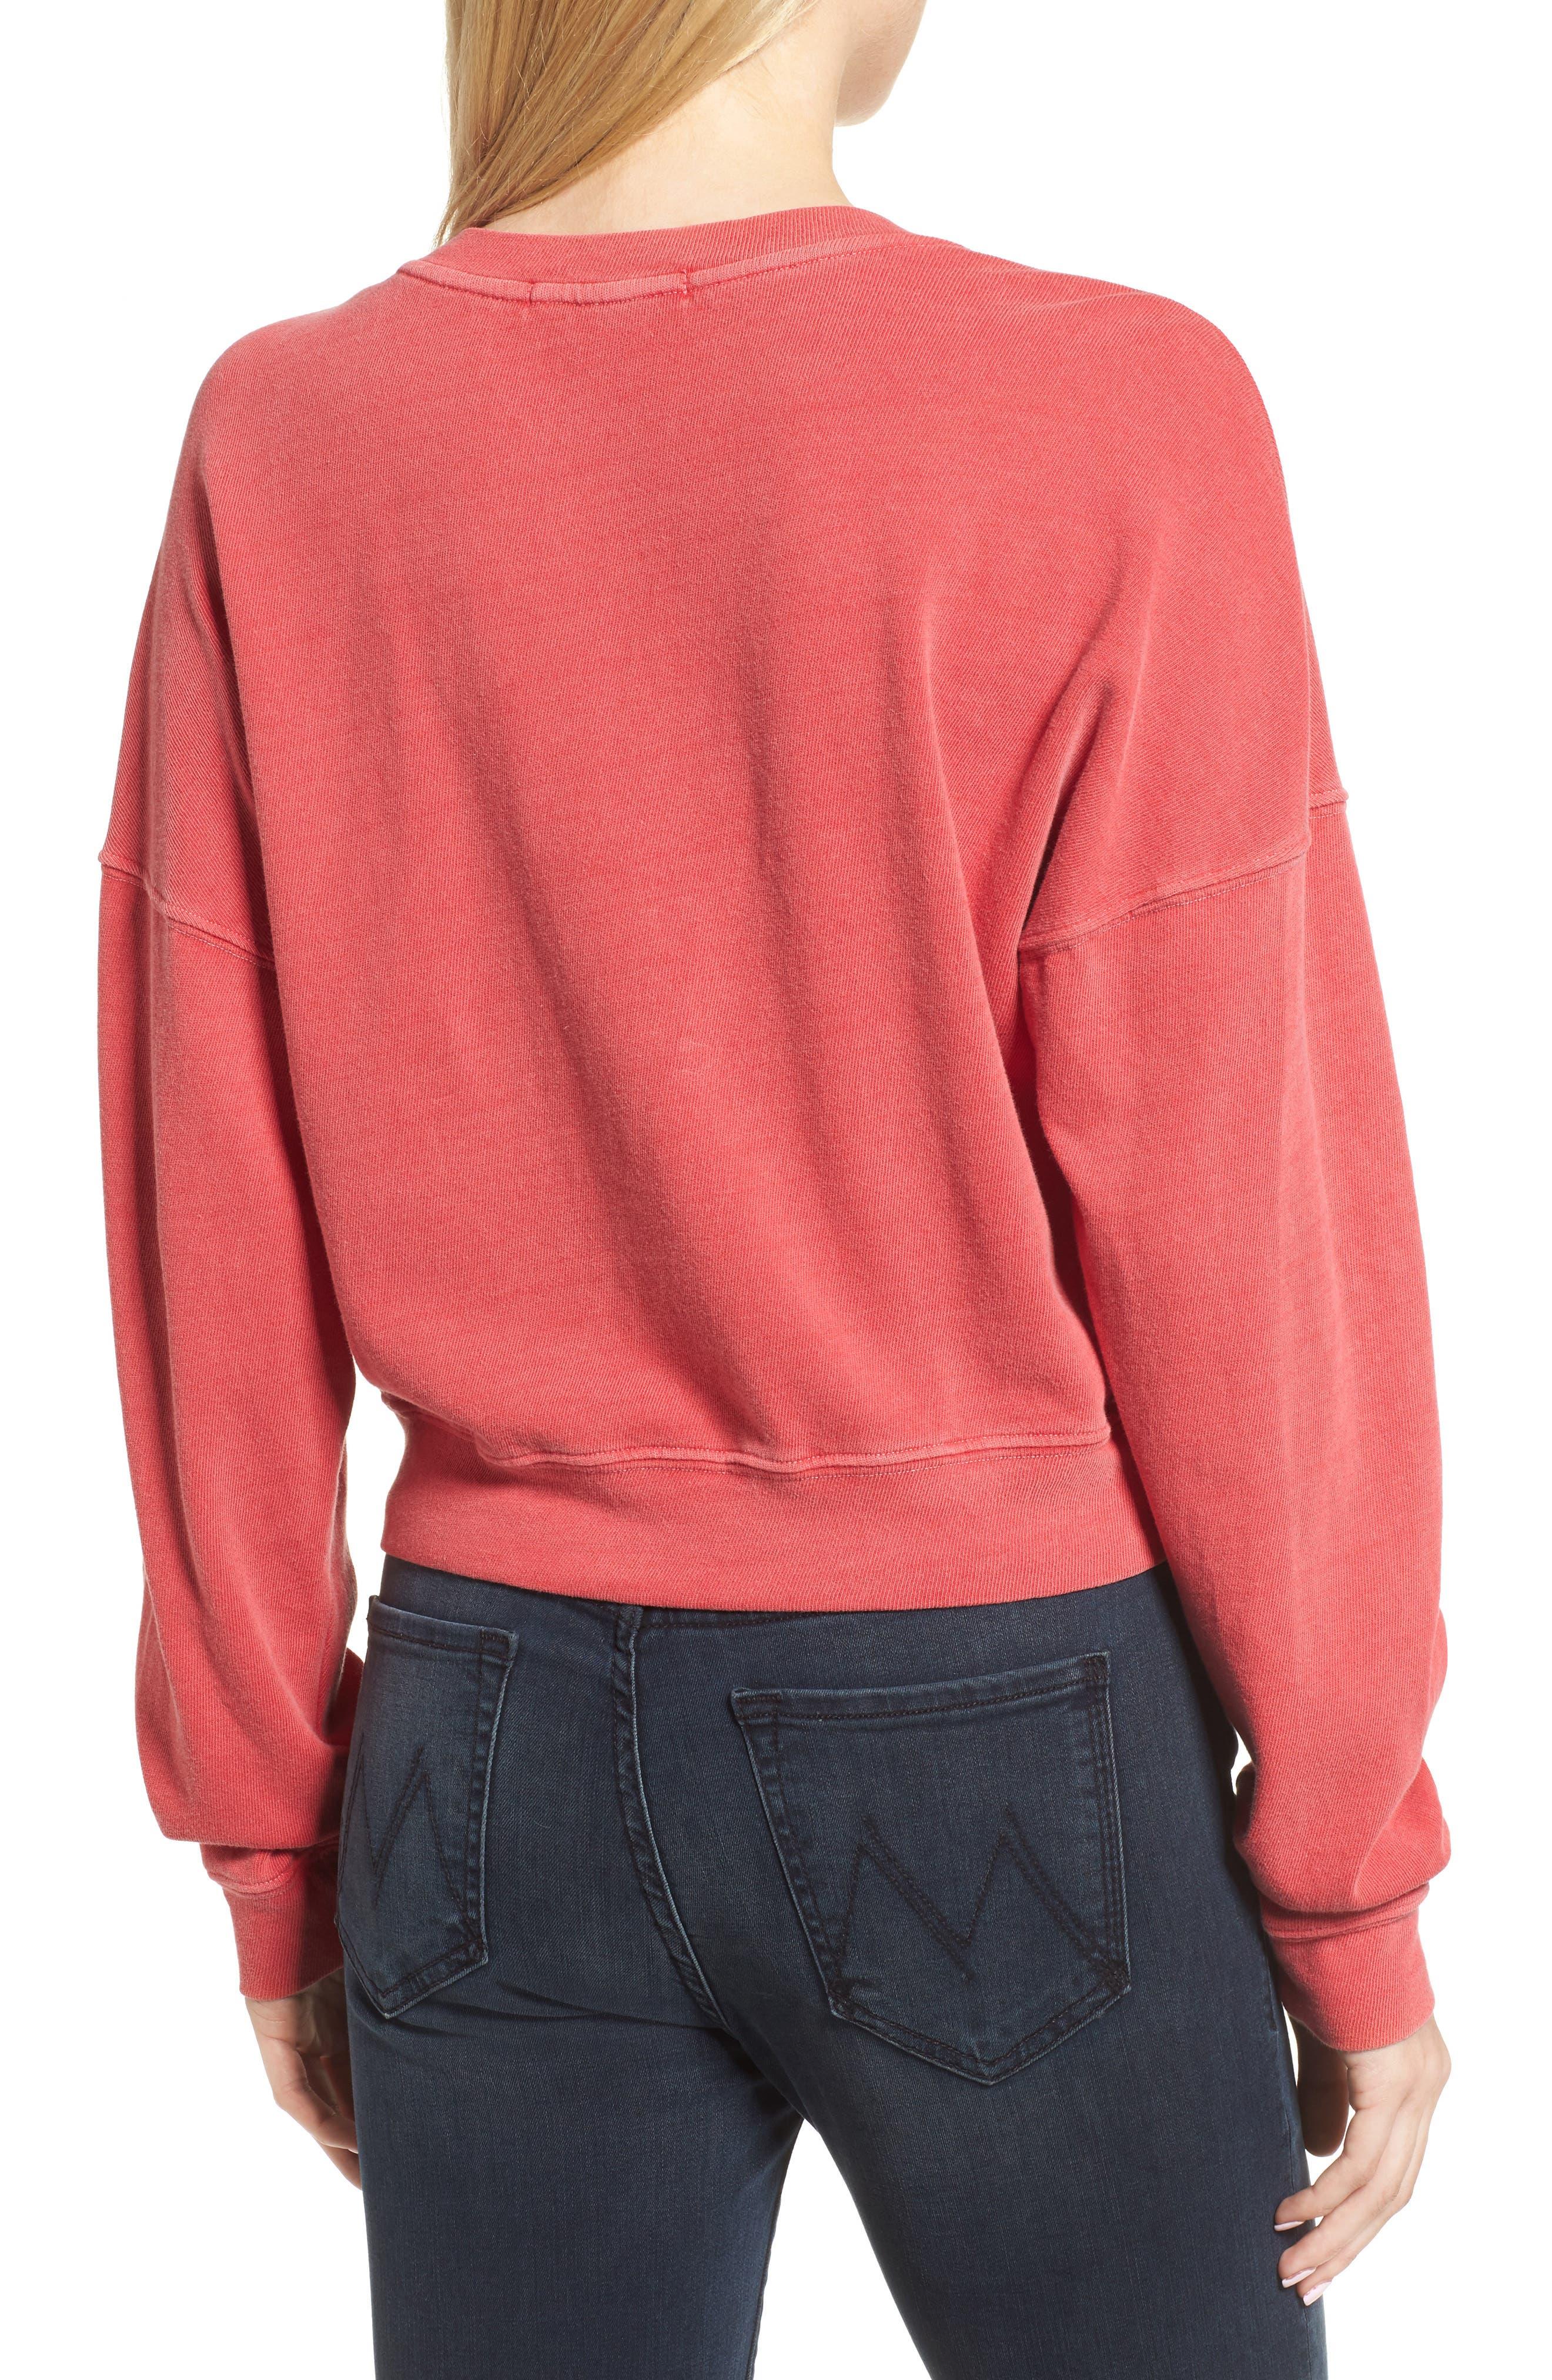 Foil Star Sweatshirt,                             Alternate thumbnail 2, color,                             600